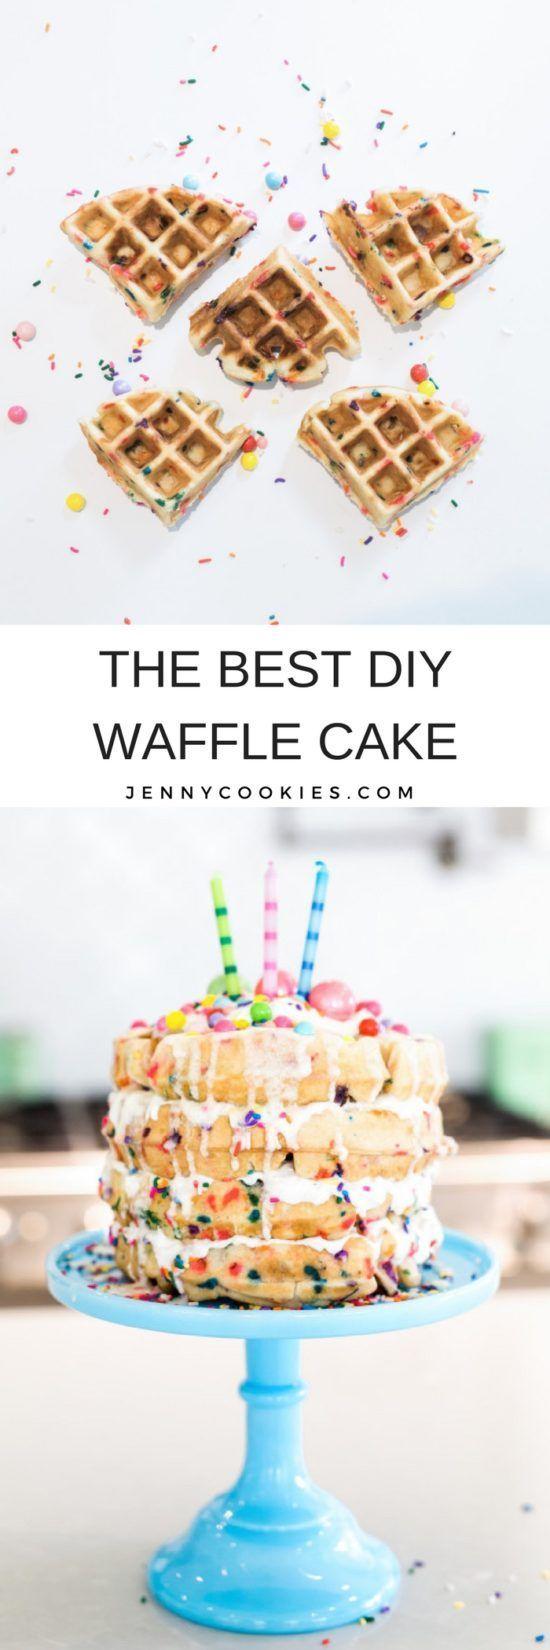 How To Make A Waffle Cake Diy Waffle Cake Unique Cake Recipes